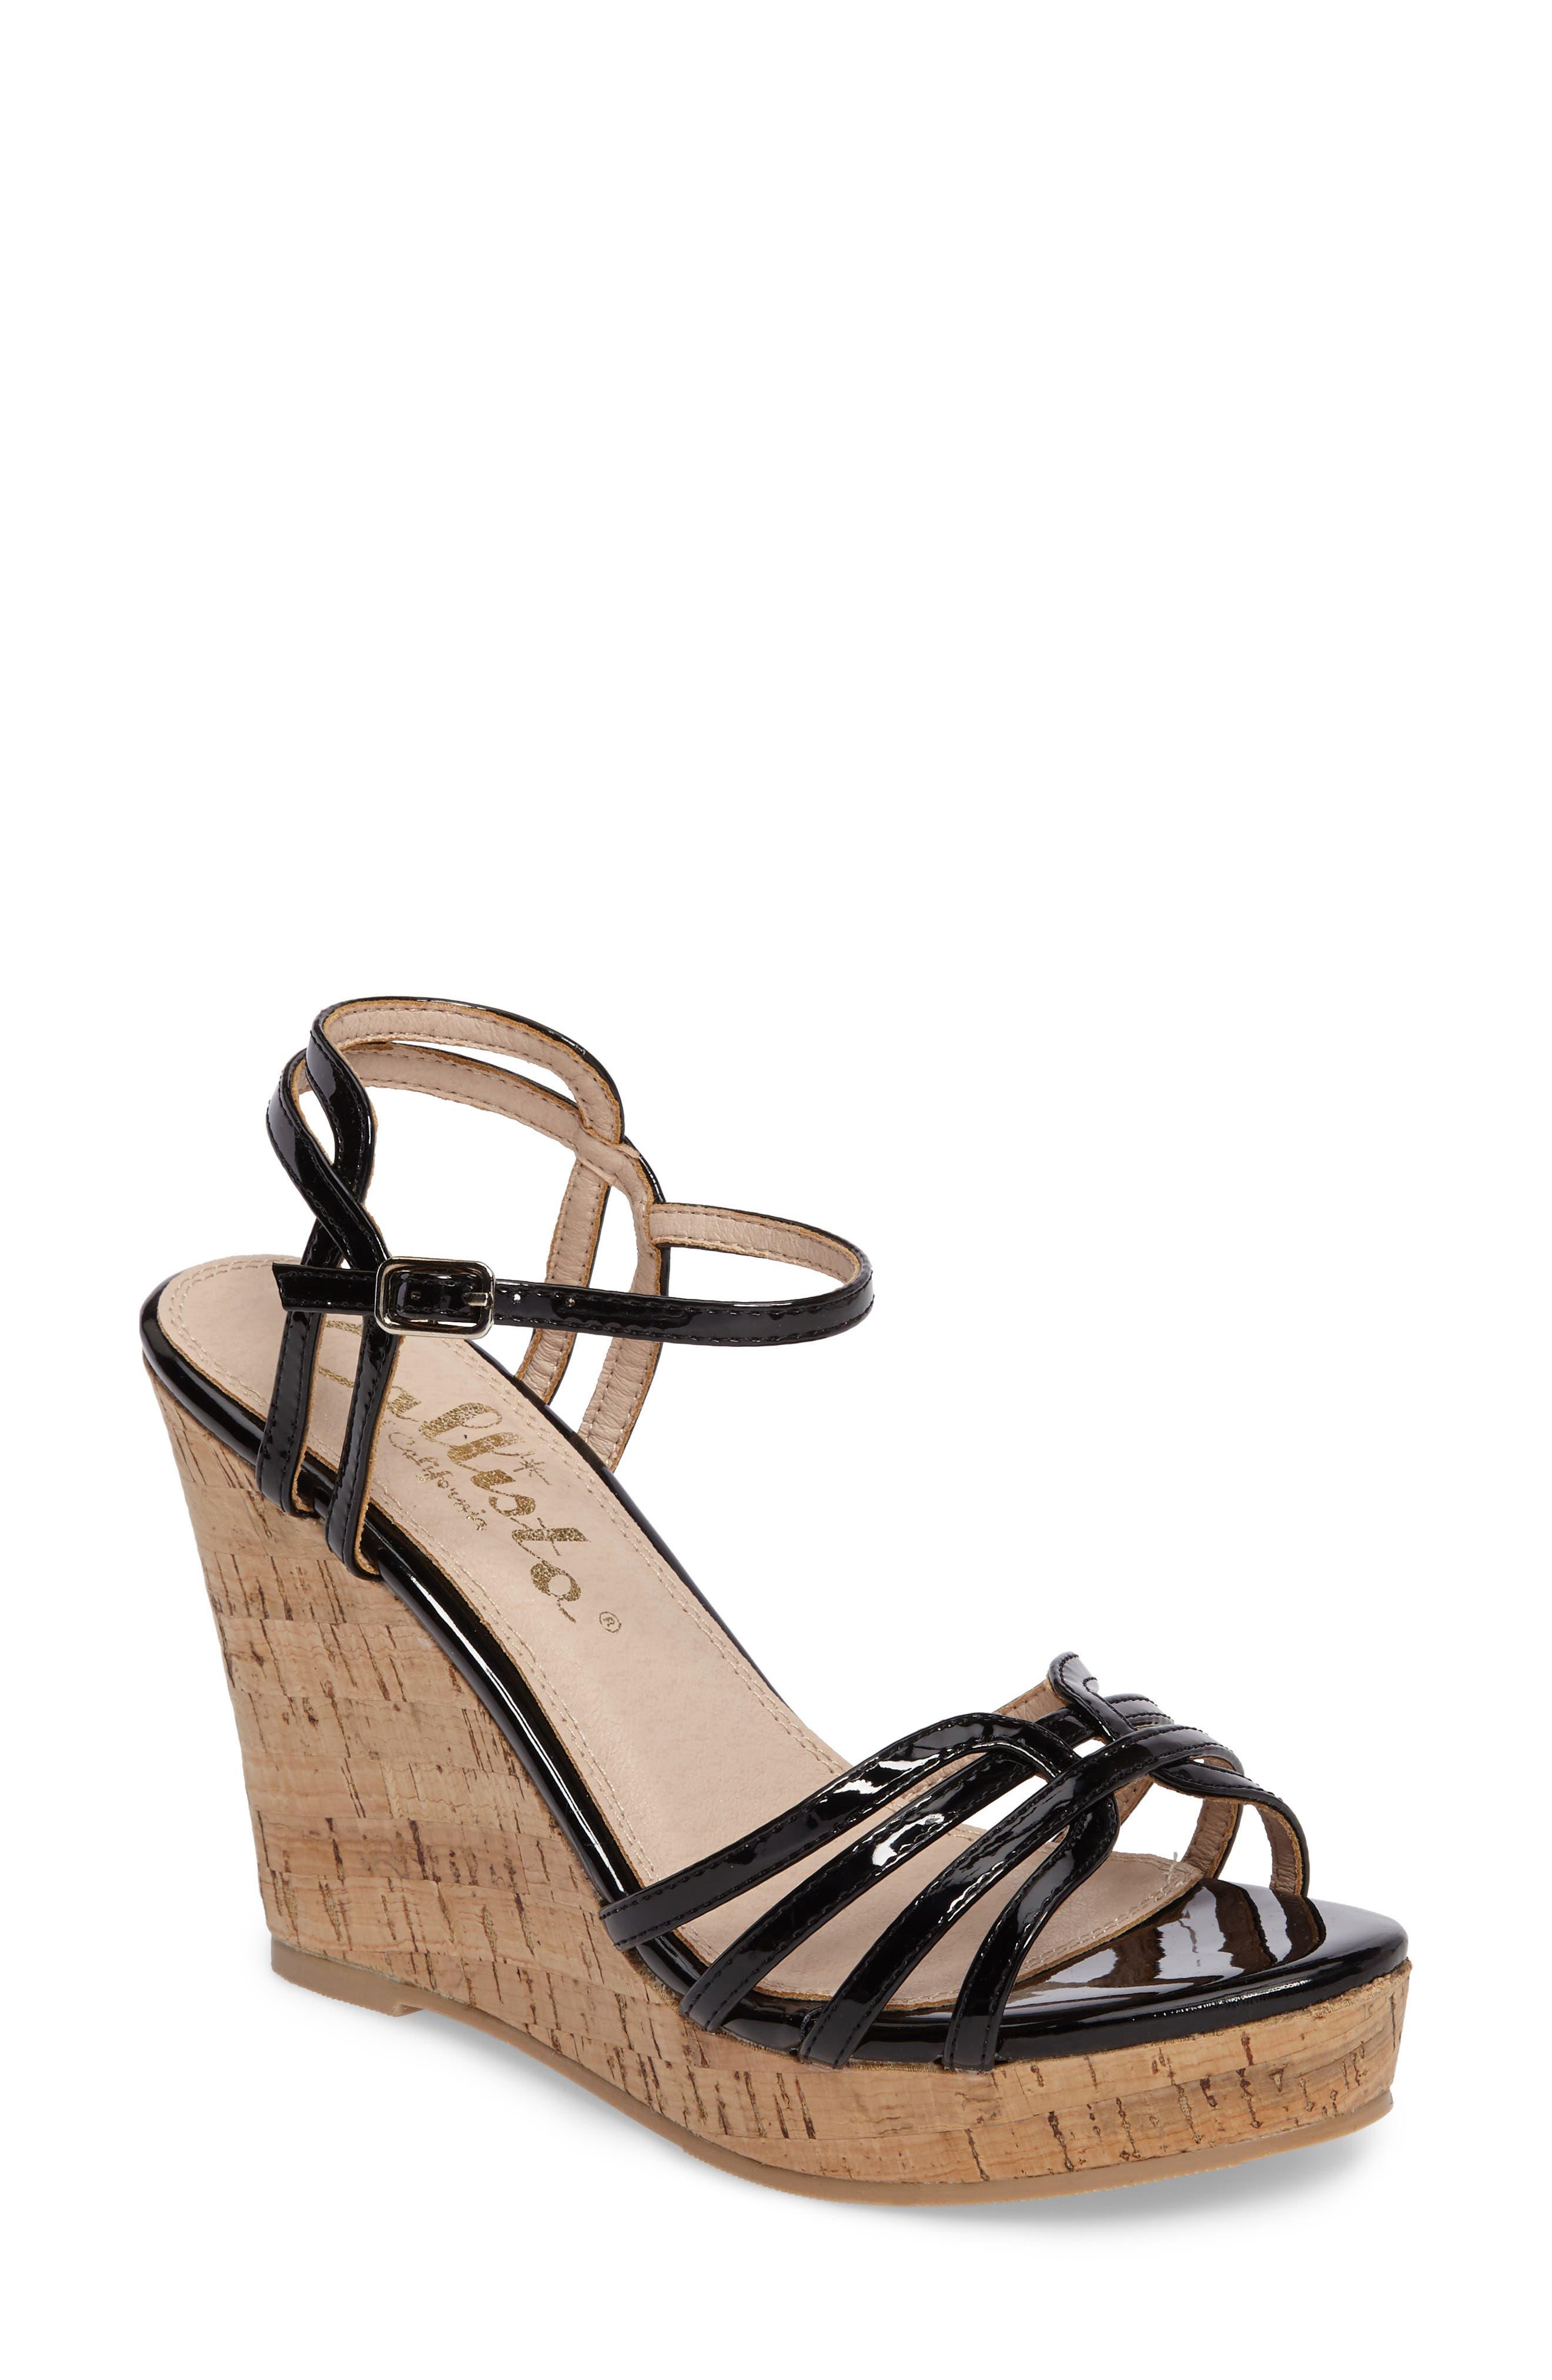 Oasis Platform Wedge Sandal,                         Main,                         color, BLACK SYNTHETIC